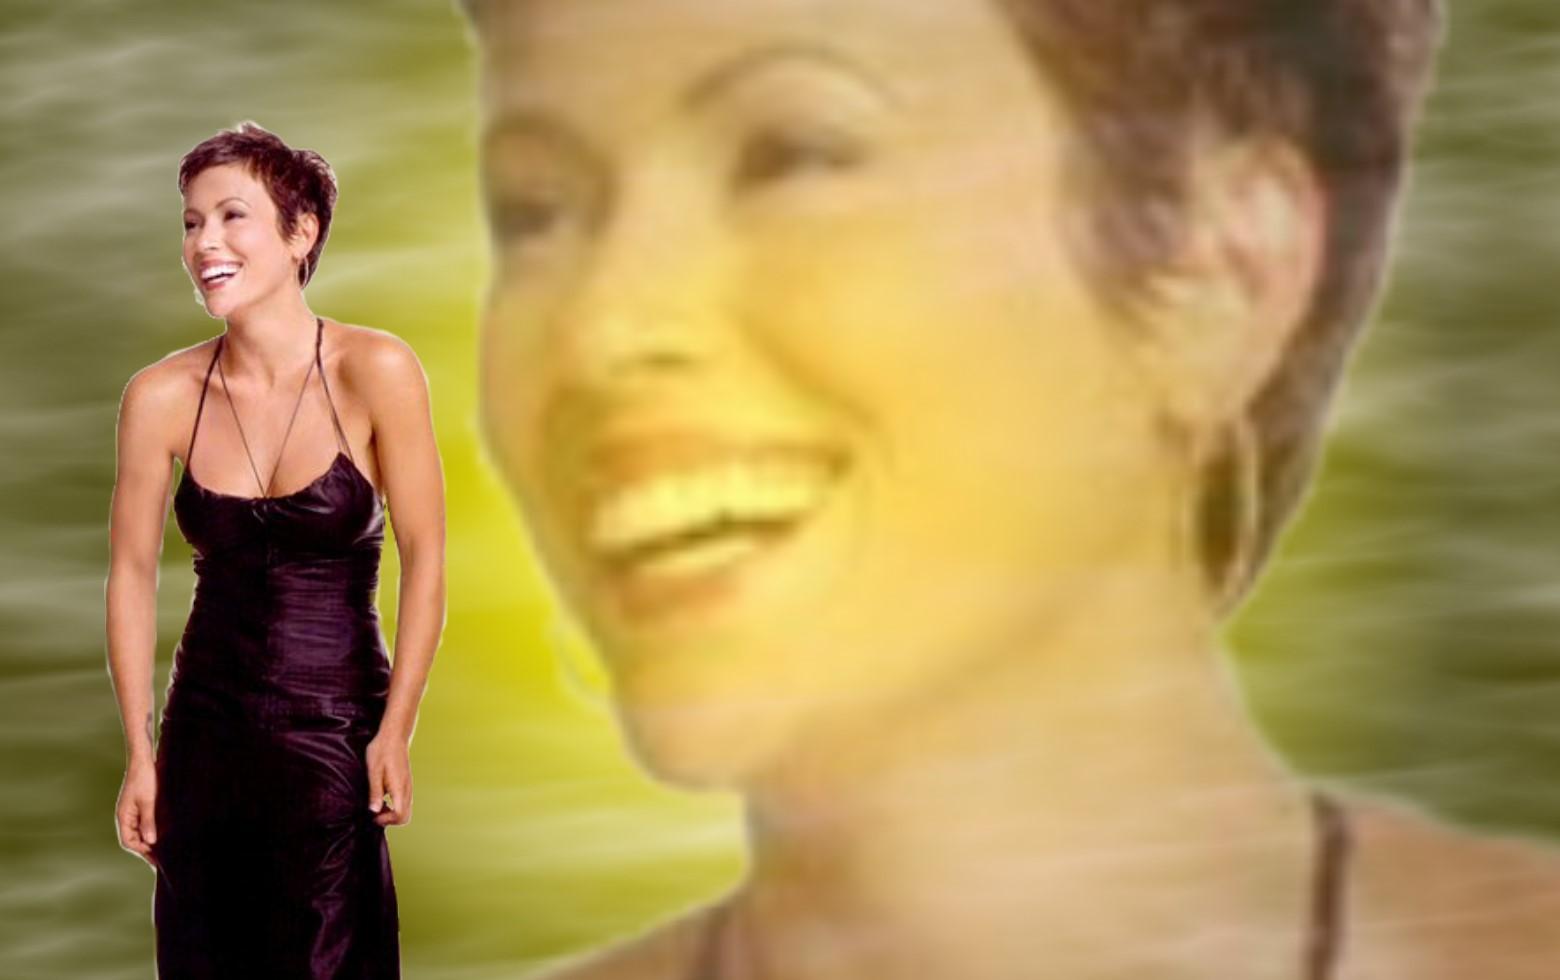 Alyssa Milano 2008 alyssa milano - charmedcharmedimsome1 on deviantart